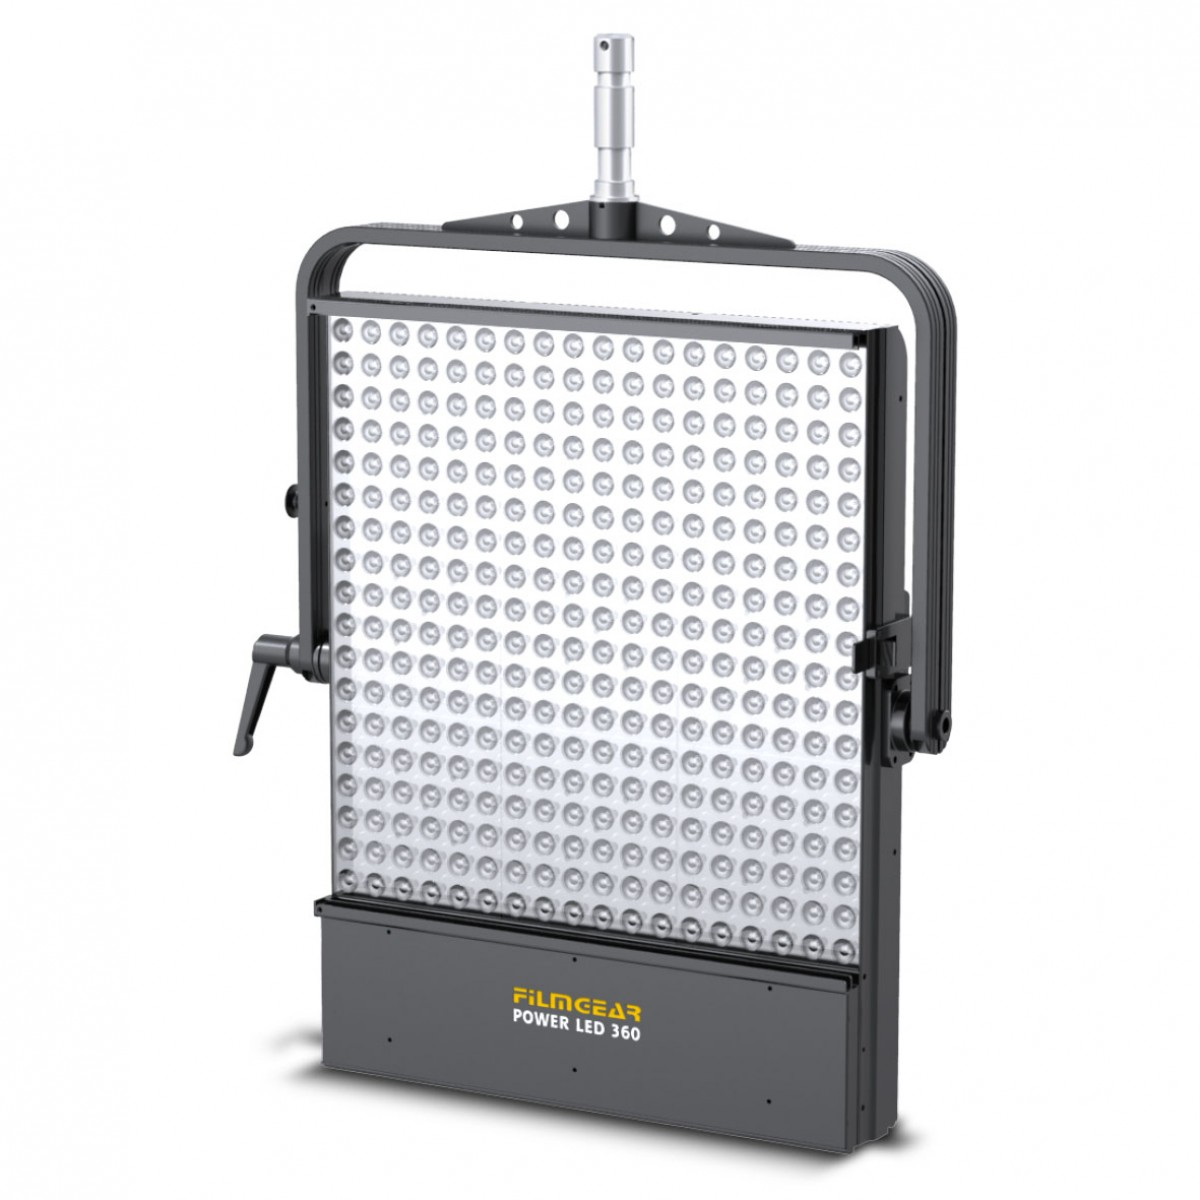 Power LED 360-1200x1200.jpg